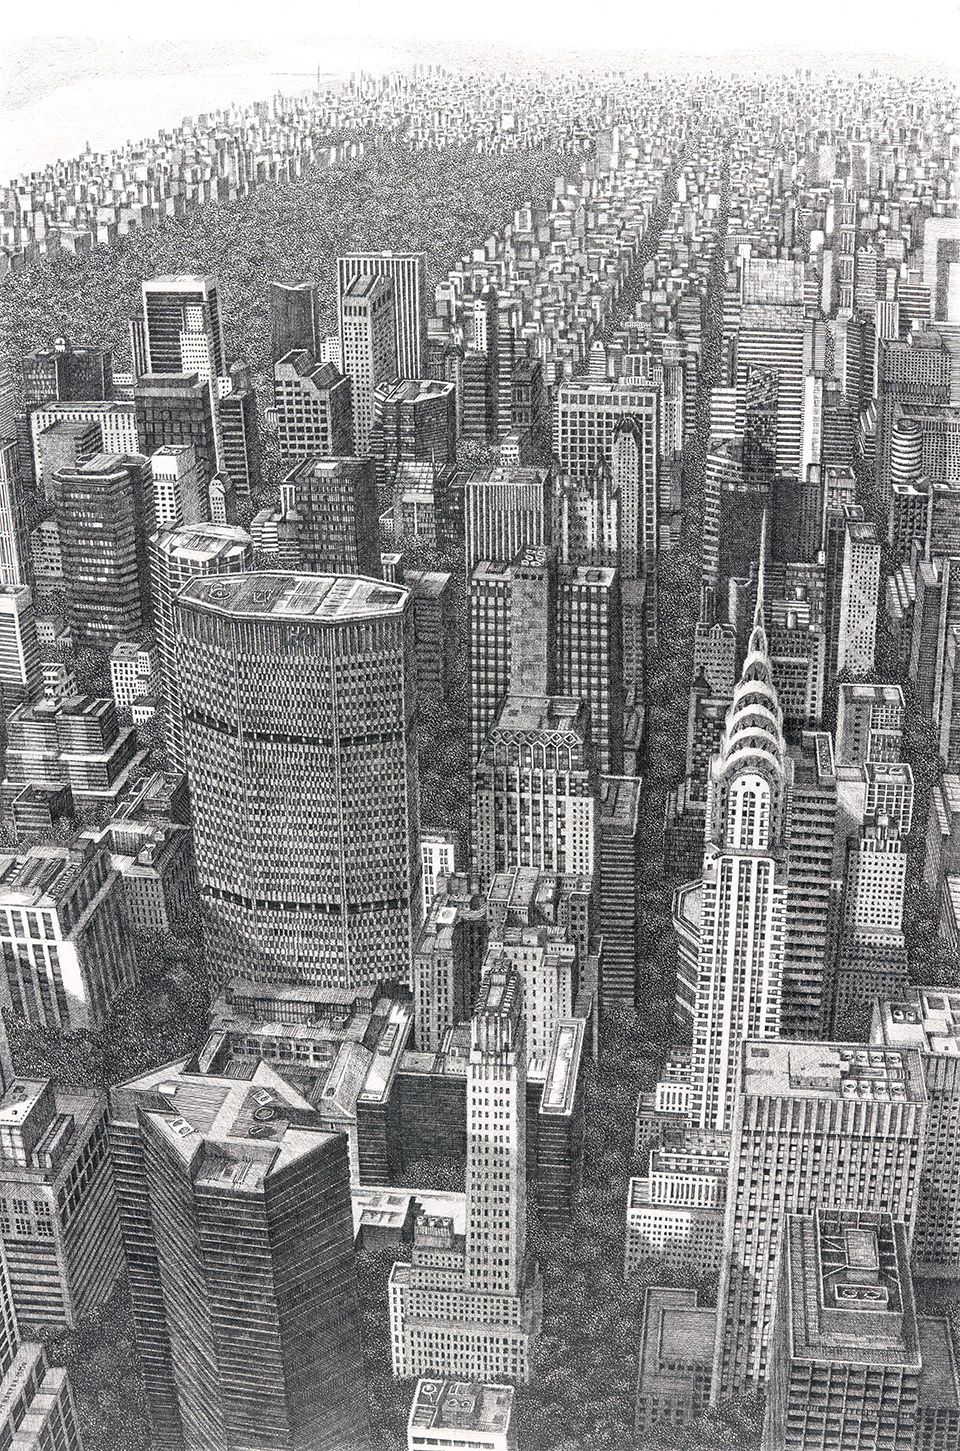 City D (New York City)